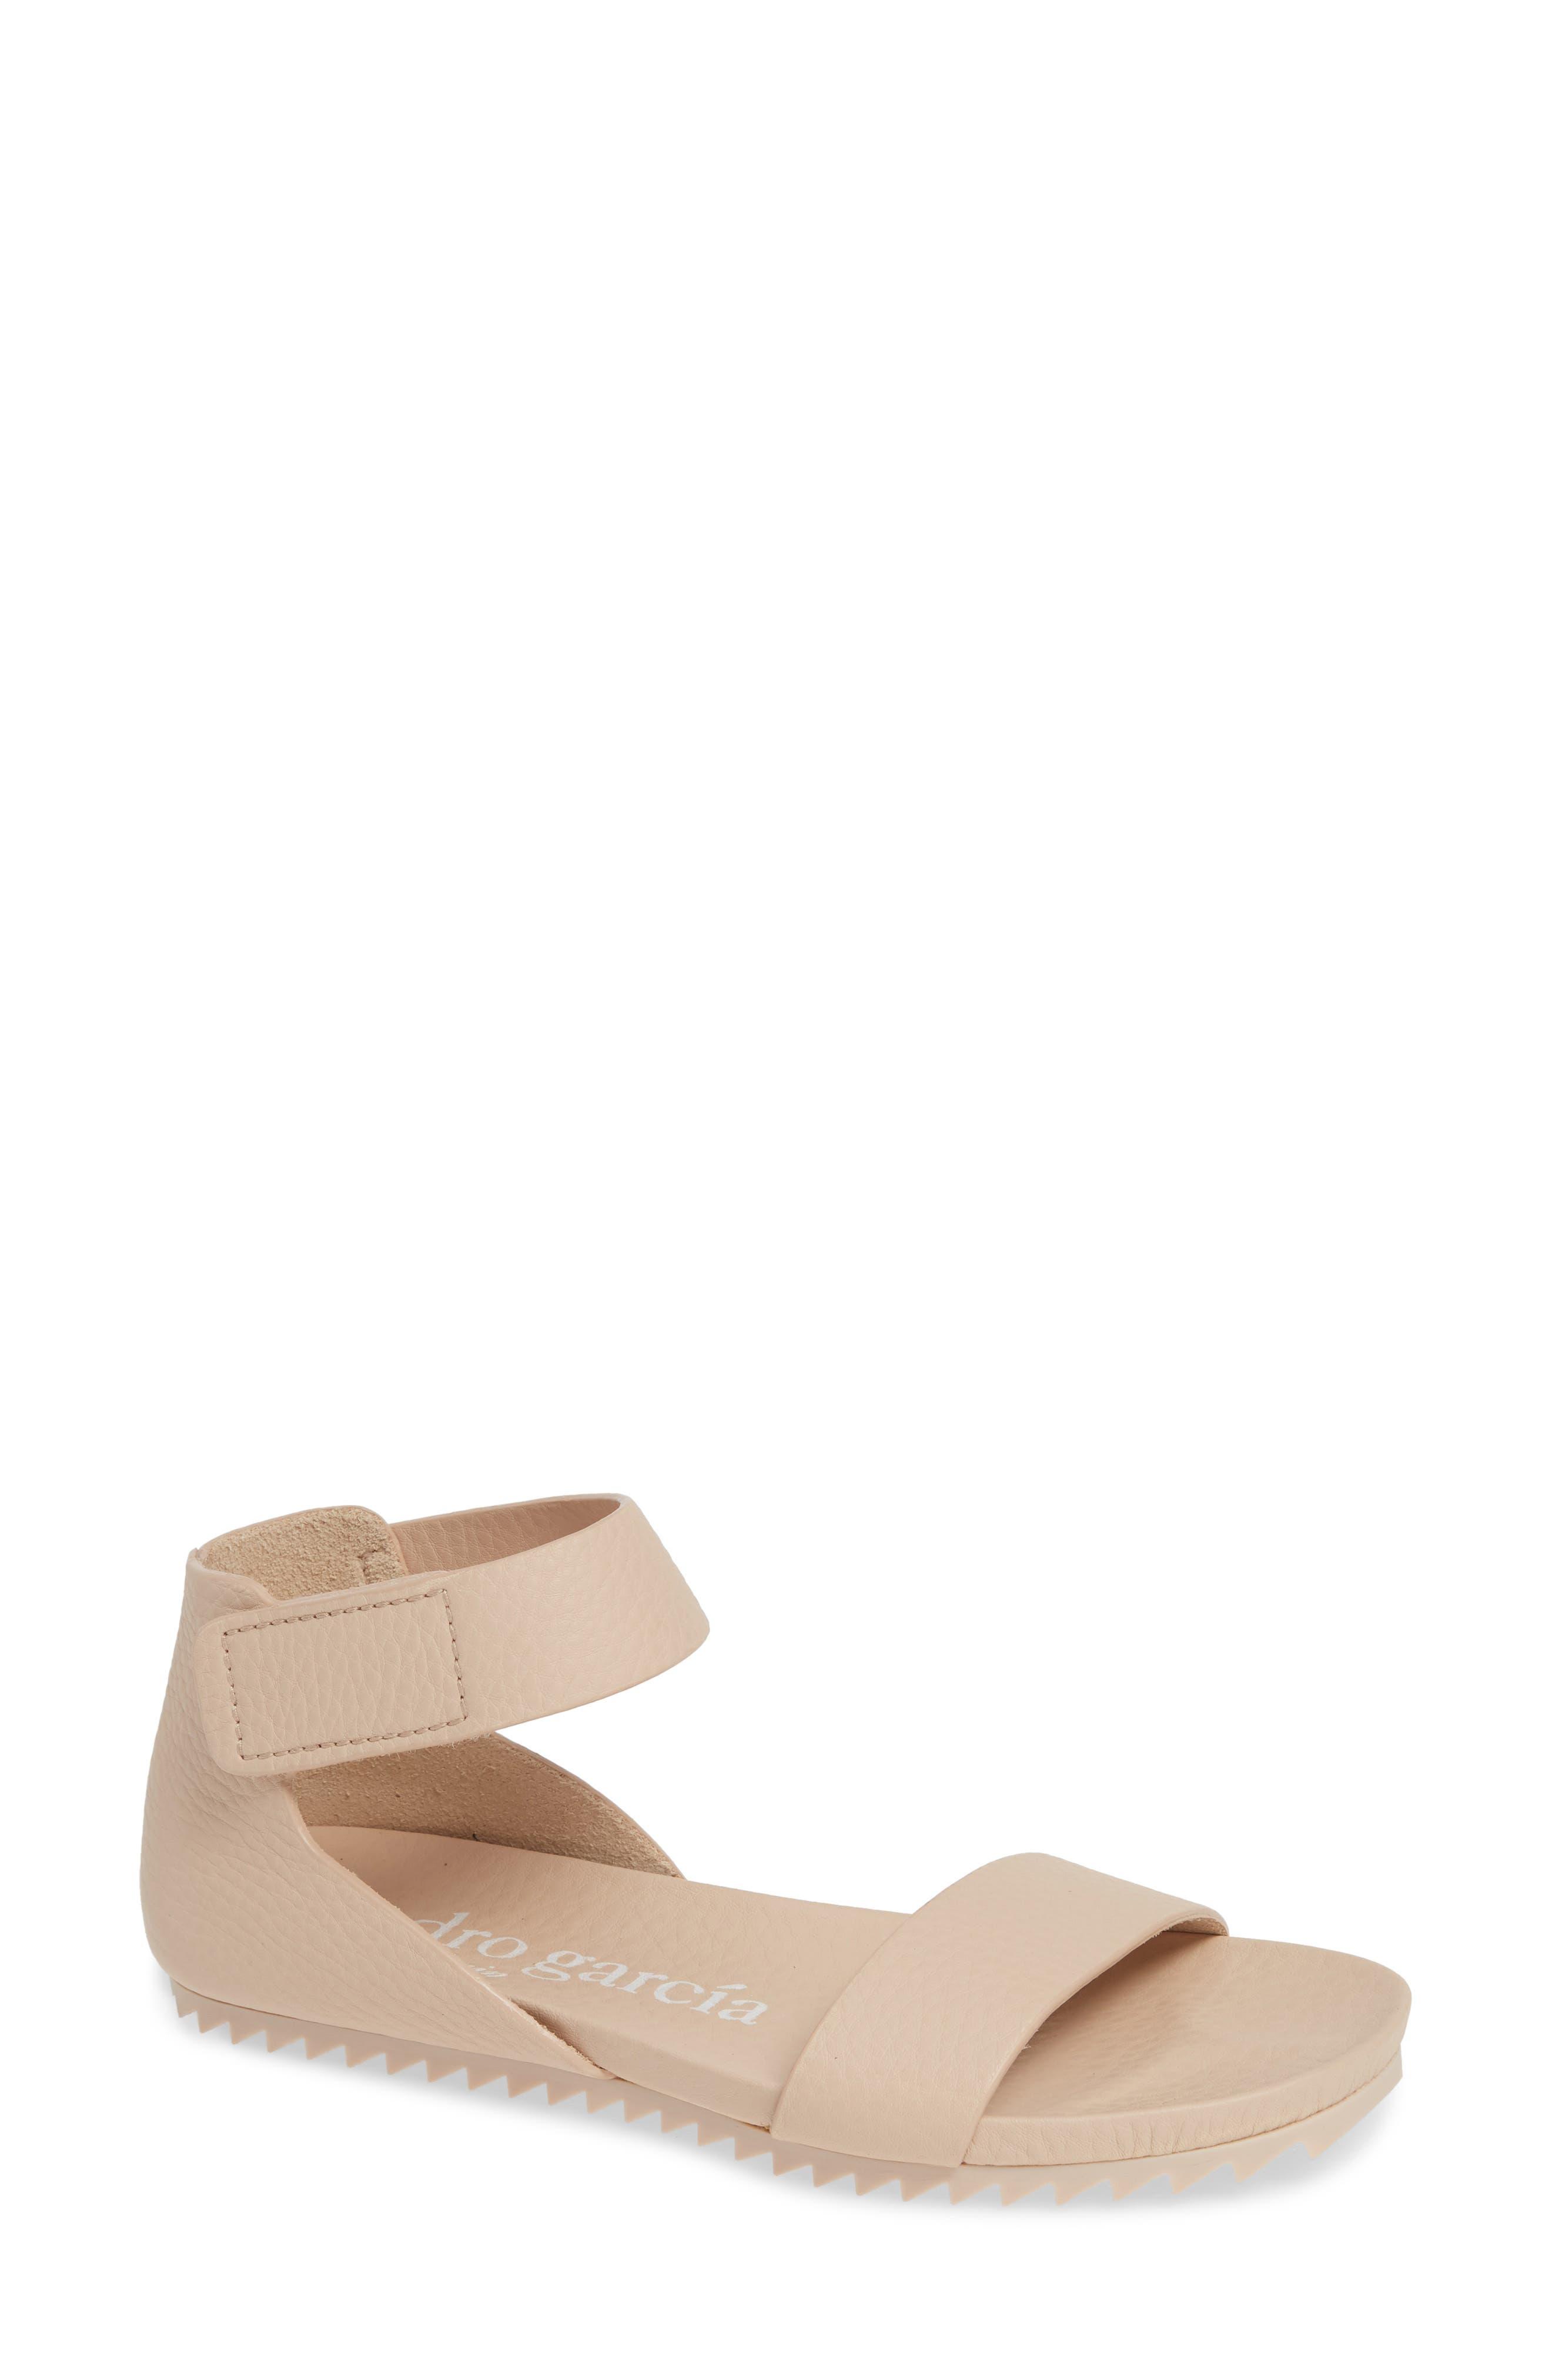 Pedro Garcia Jalila Ankle Strap Sandal, Size - (Nordstrom Exclusive)